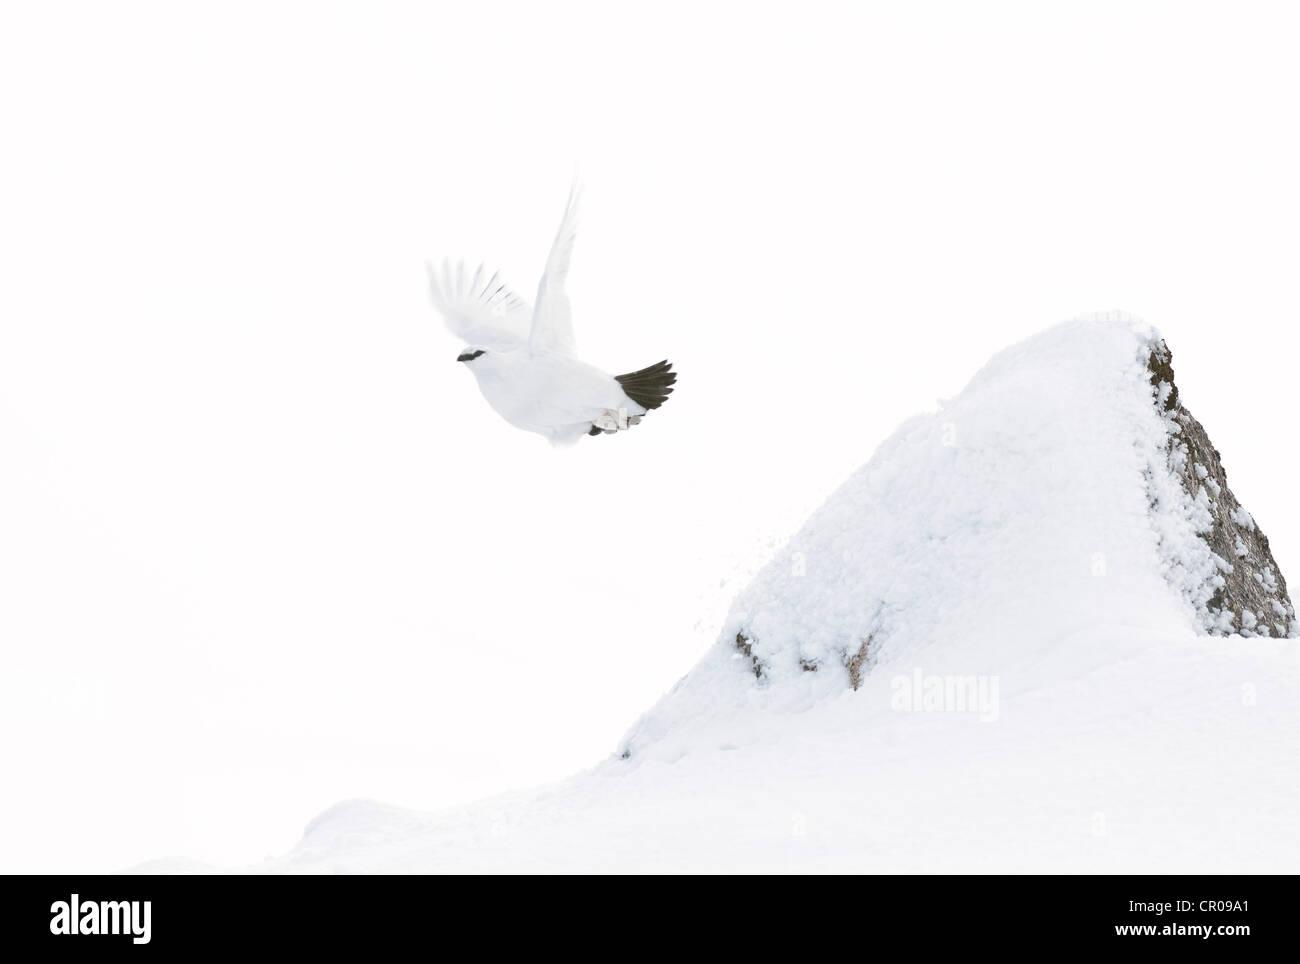 Rock ptarmigan (Lagopus mutus) adult female in flight, in snowy mountain landscape. Cairngorms National Park, Scotland. - Stock Image